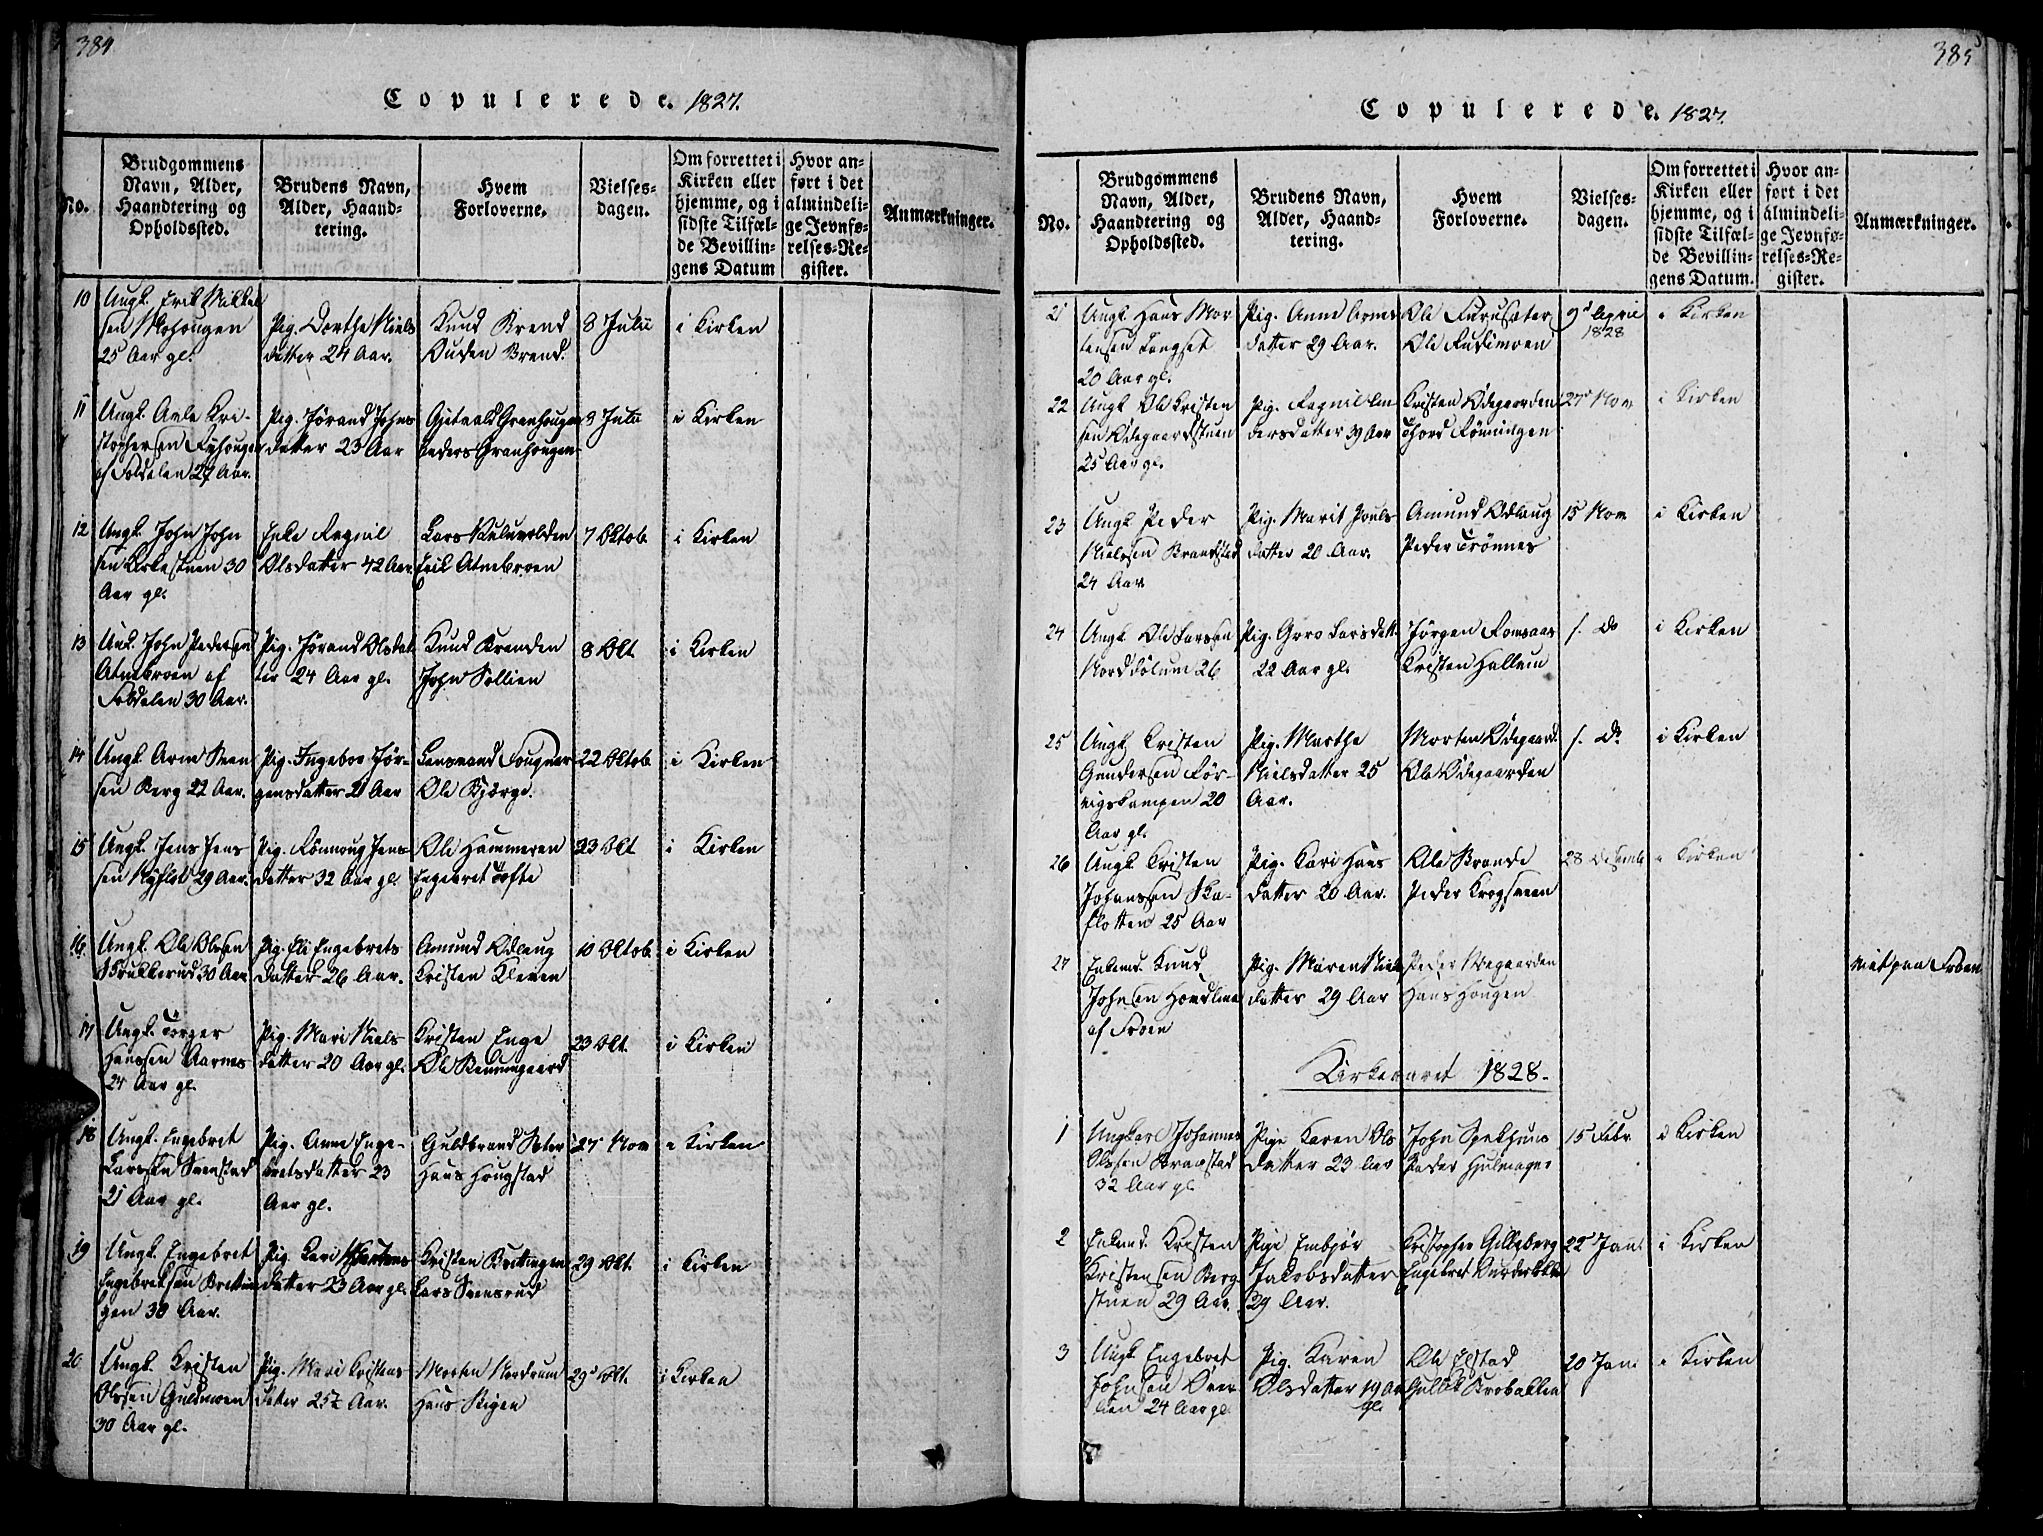 SAH, Ringebu prestekontor, Ministerialbok nr. 4, 1821-1839, s. 384-385